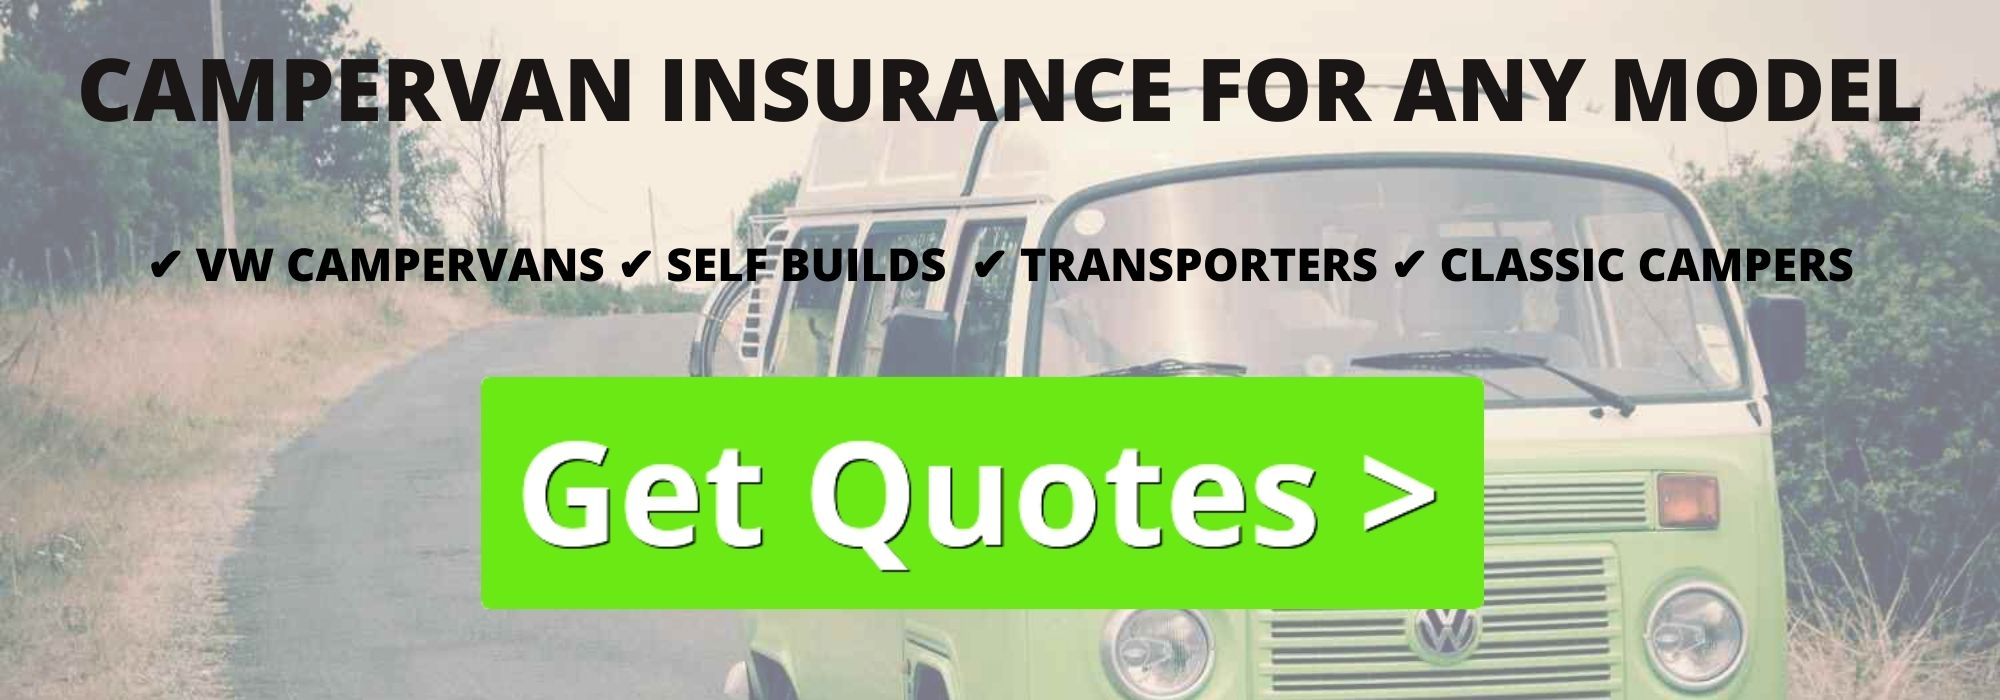 Using campervan insurance brokers